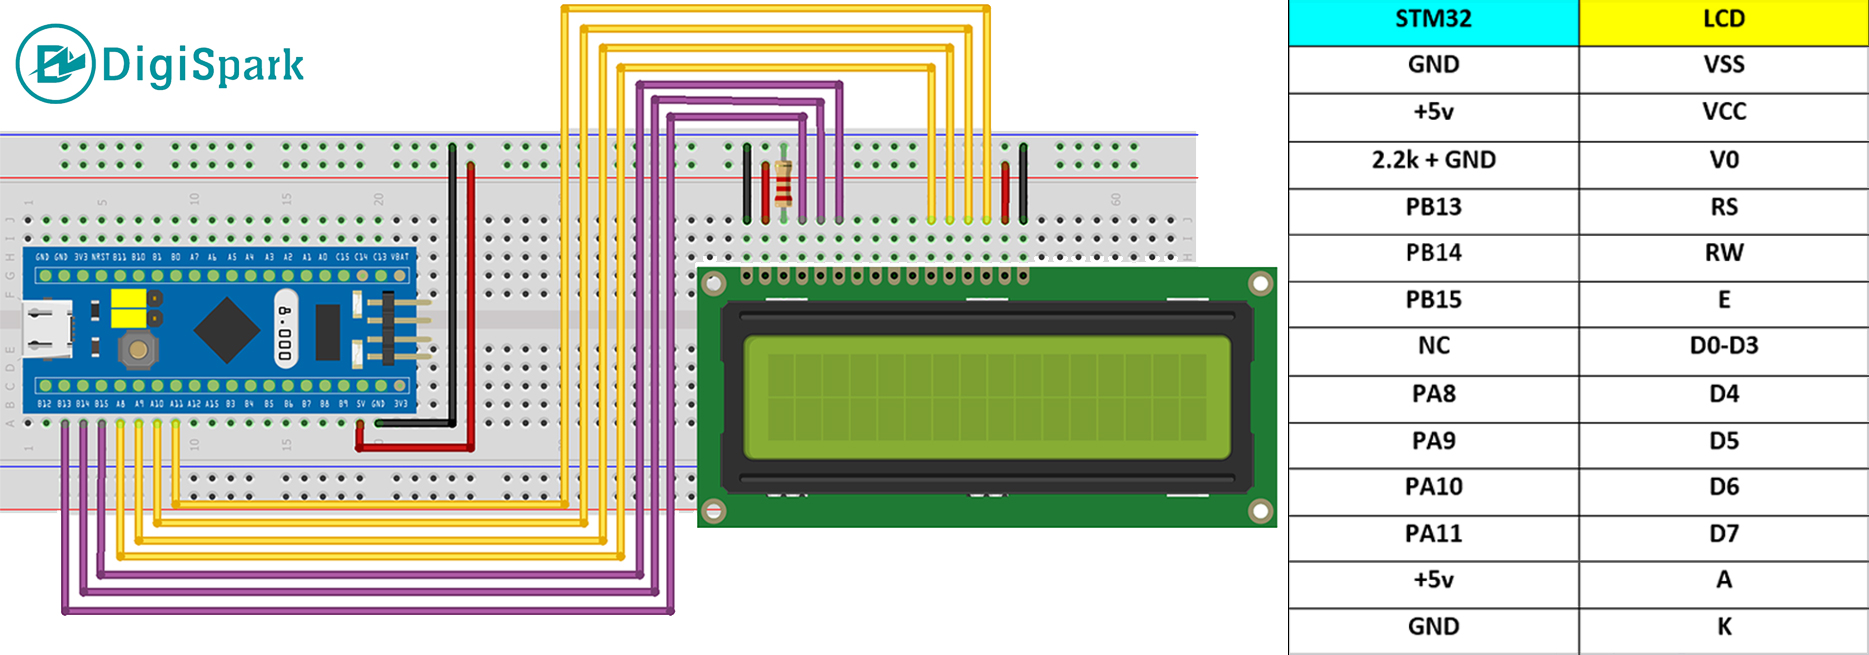 اتصالات LCD کاراکتری به STM32 - دیجی اسپارک